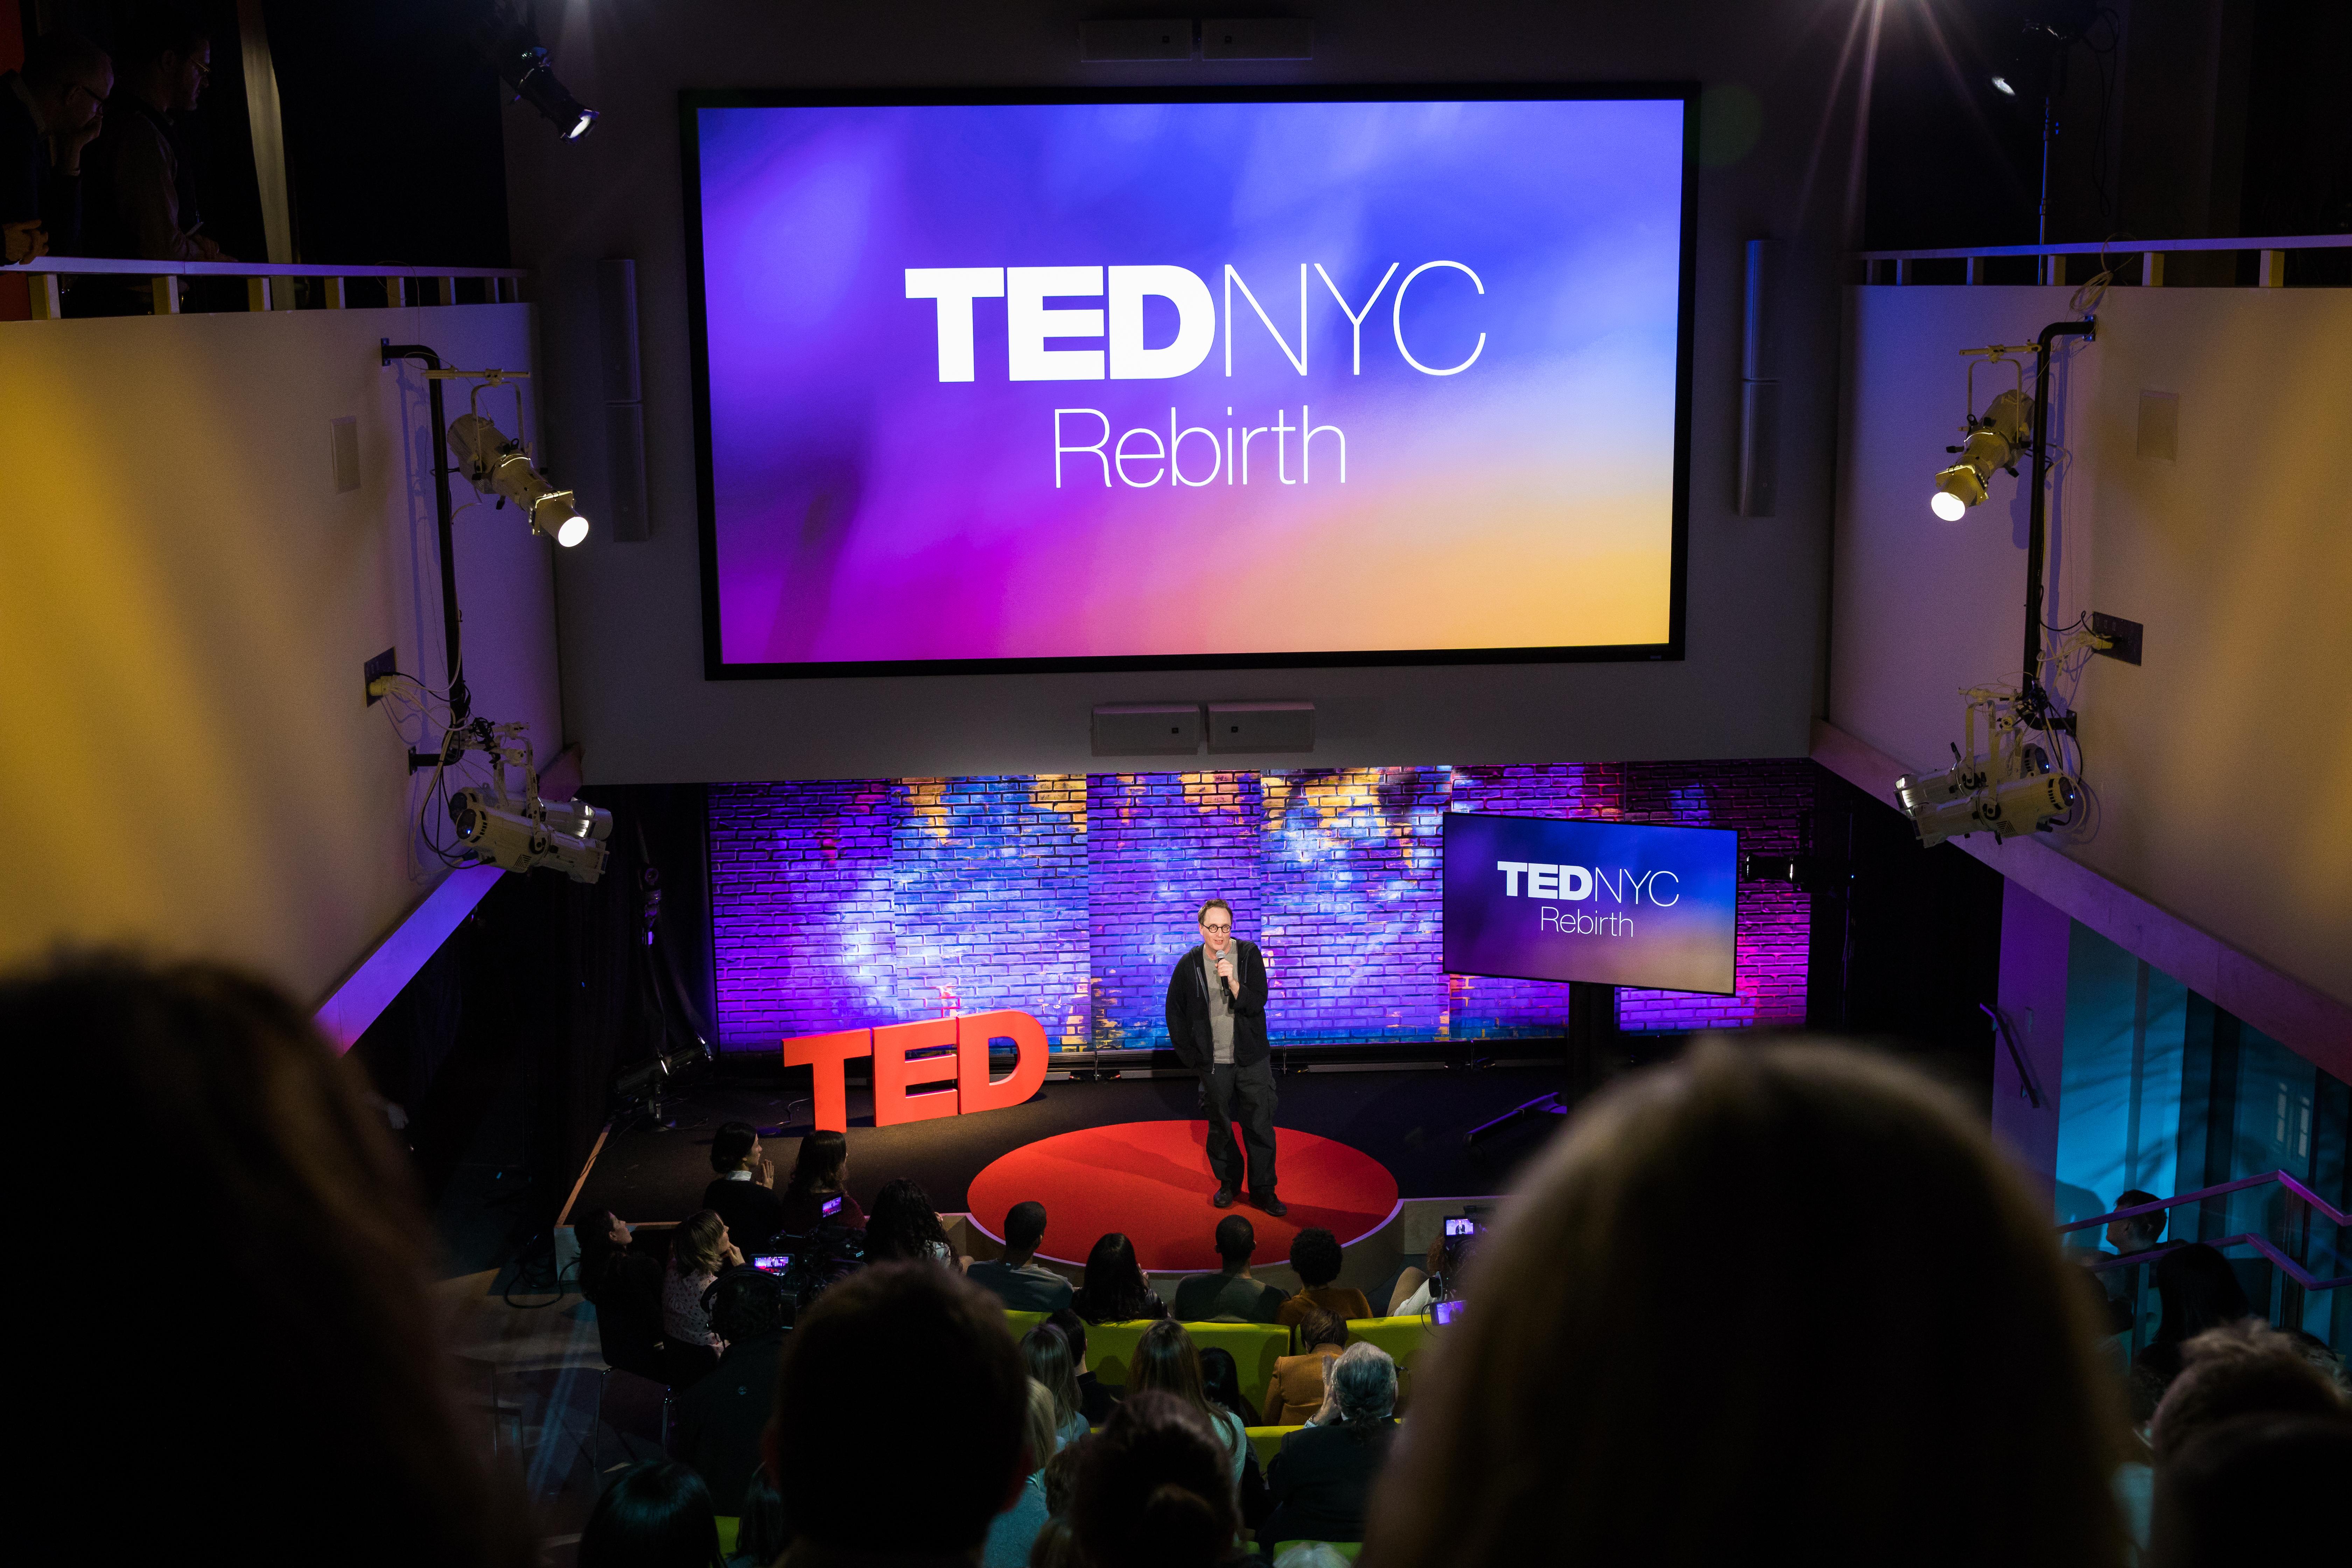 Jon Ronson speaks at TEDNYC - Rebirth, February 15, 2017, New York, NY. Photo: Dian Lofton / TED